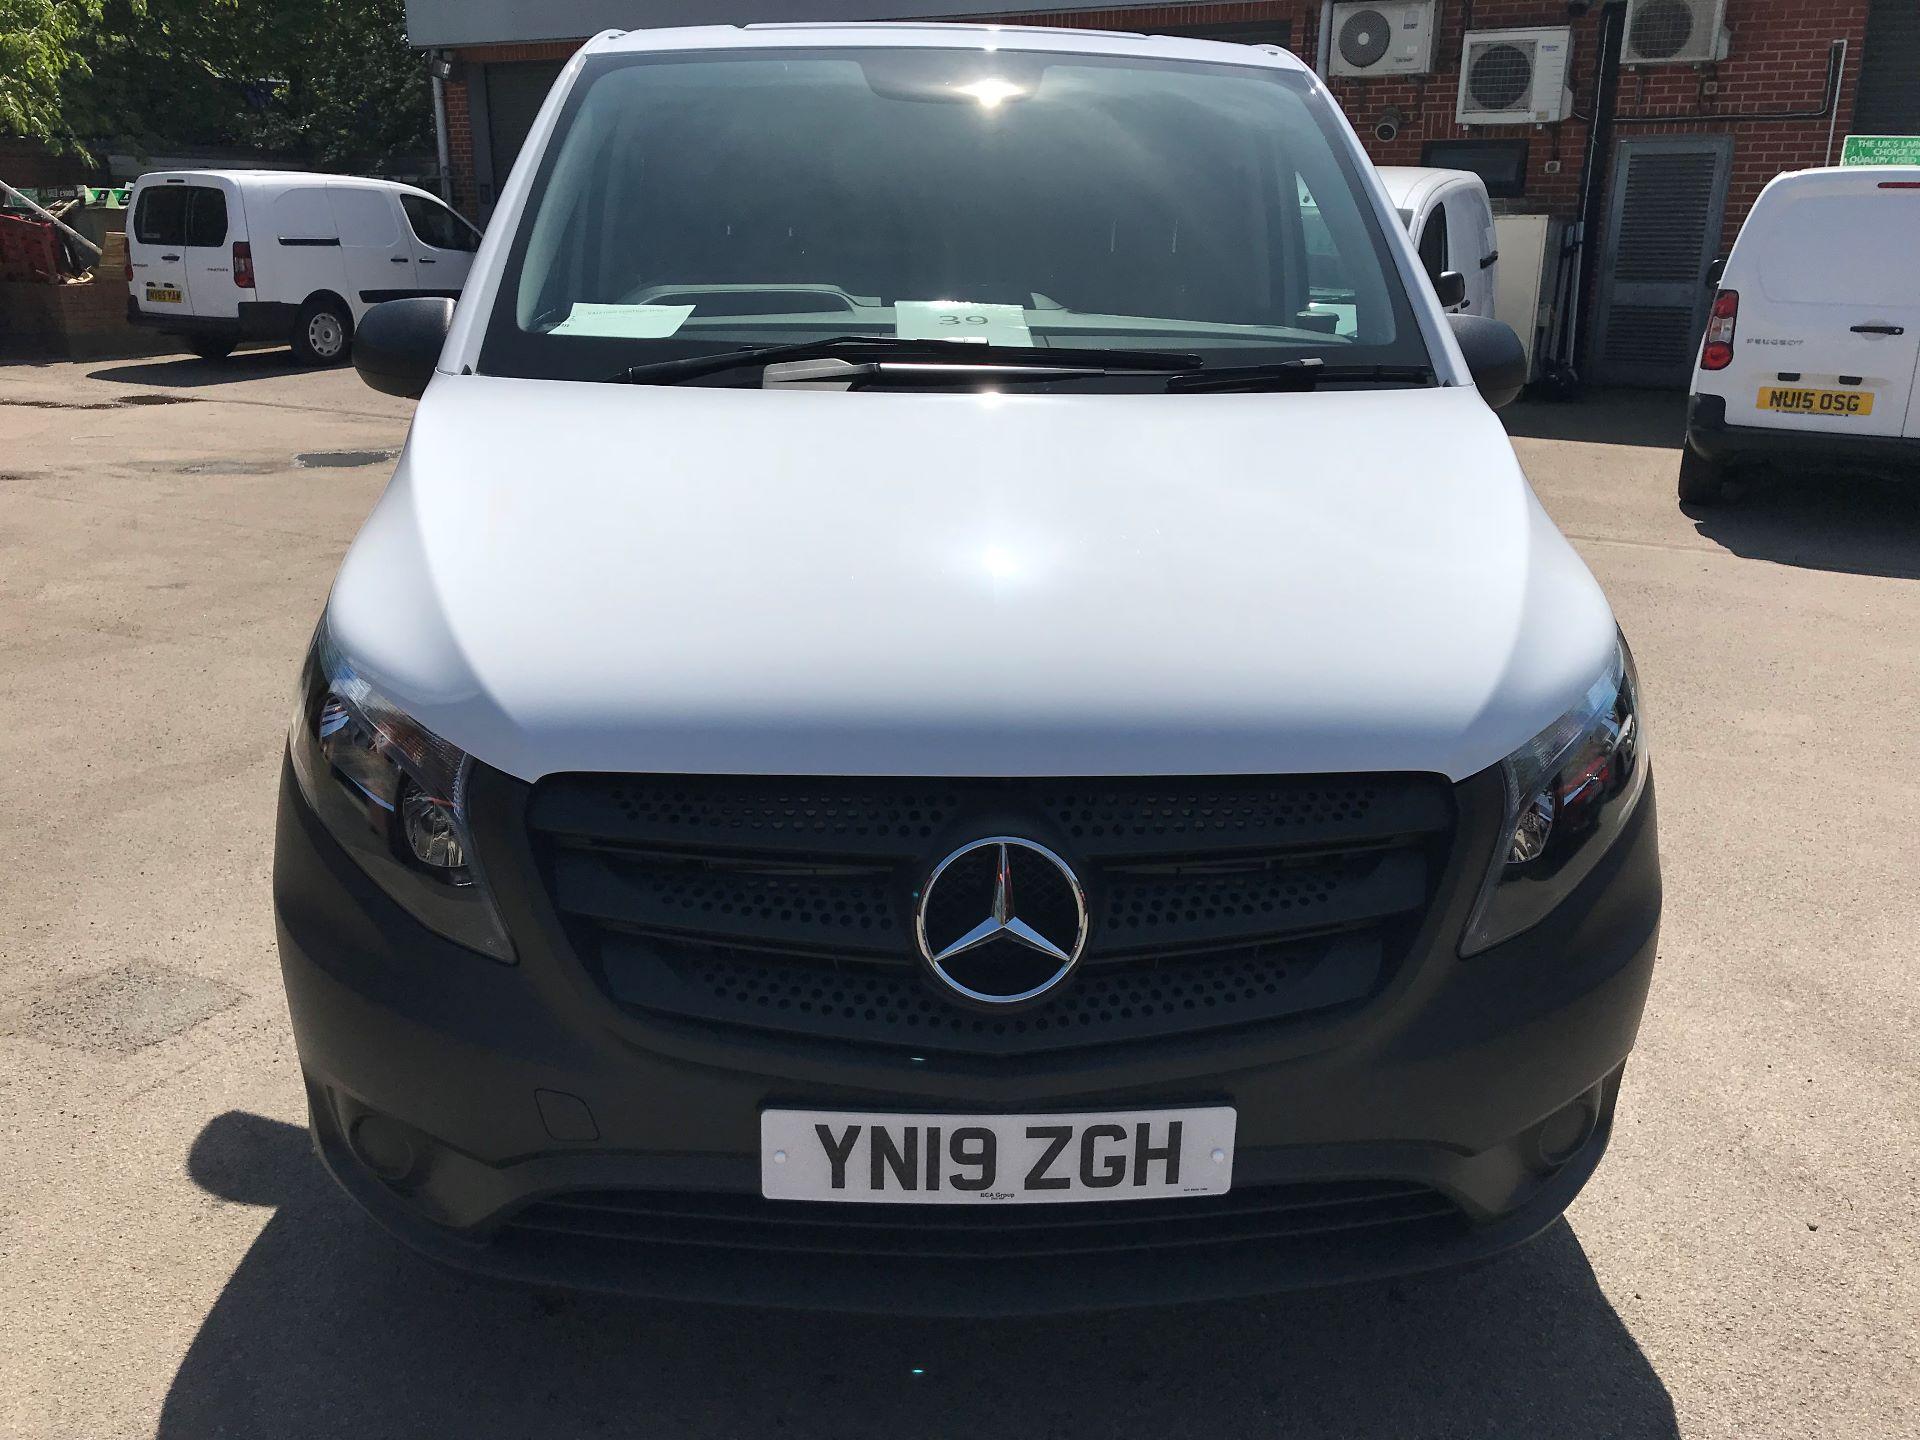 2019 Mercedes-Benz Vito 111CDI LWB 110PS EURO 6, AIR CON (YN19ZGH) Image 18